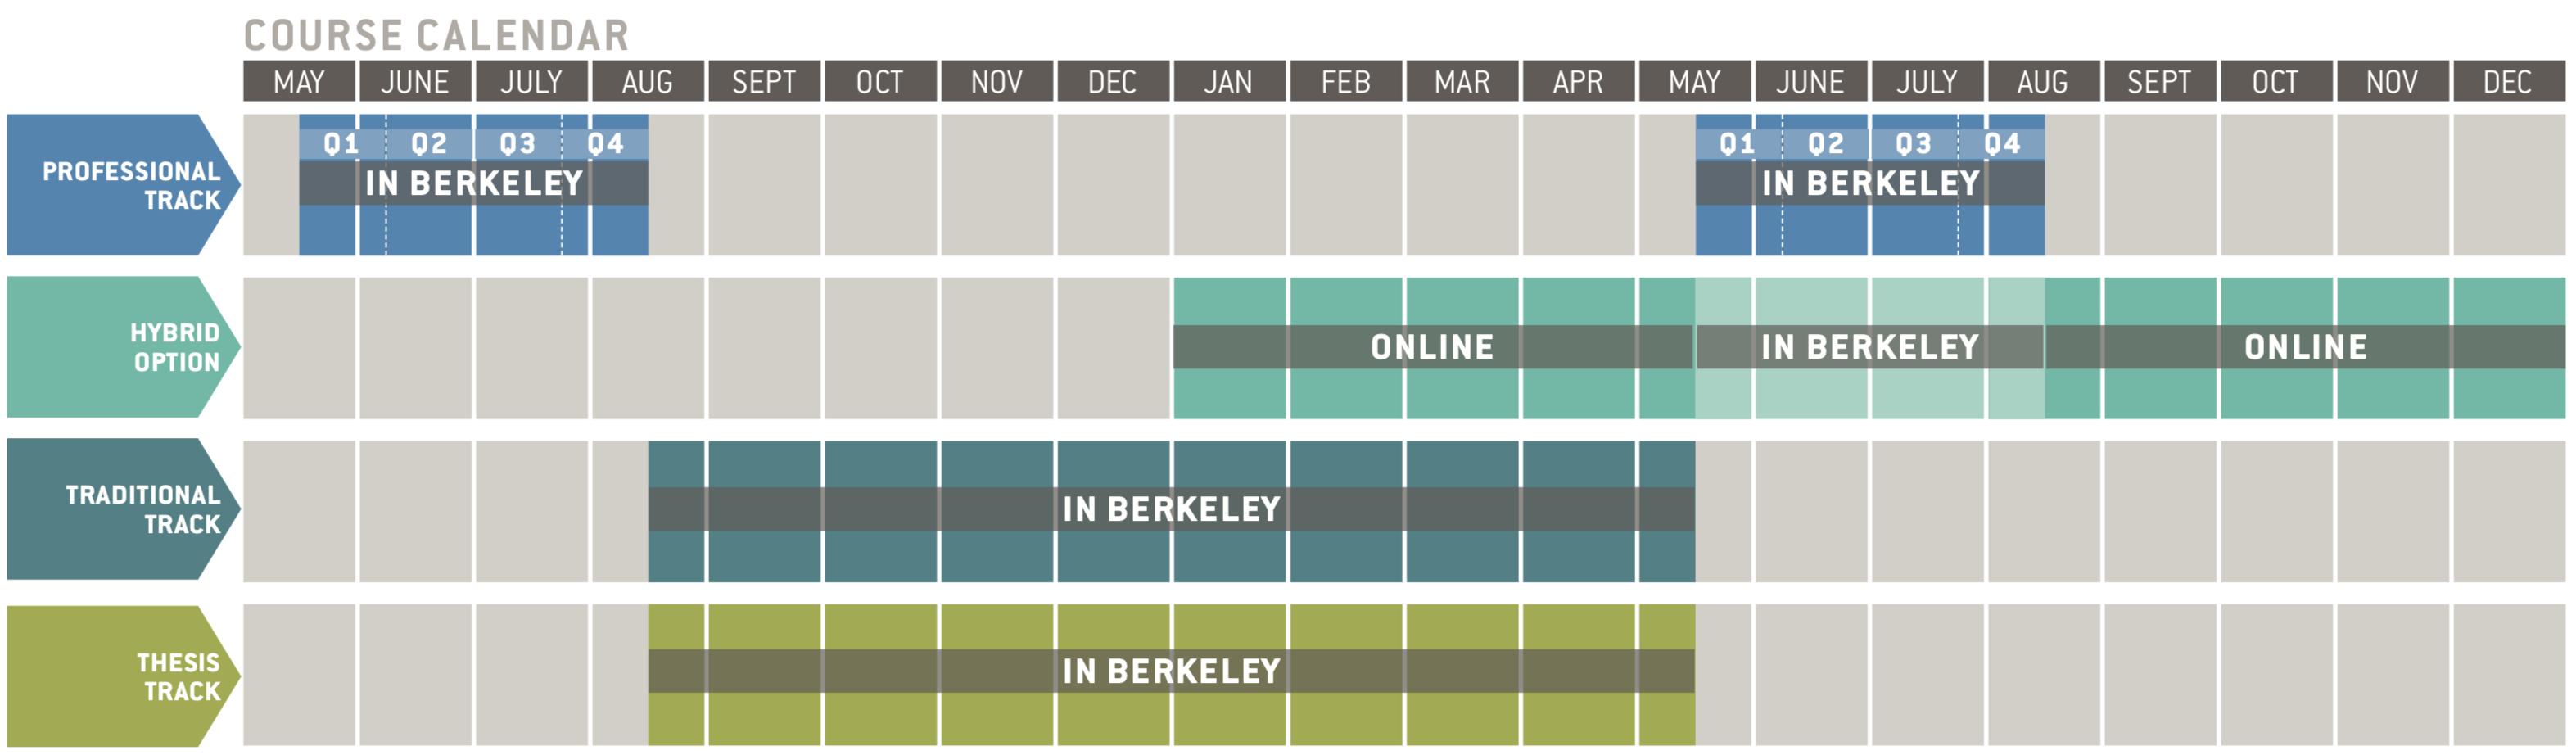 Ll.m. Programs | Berkeley Law throughout Berkeley Academic Calender